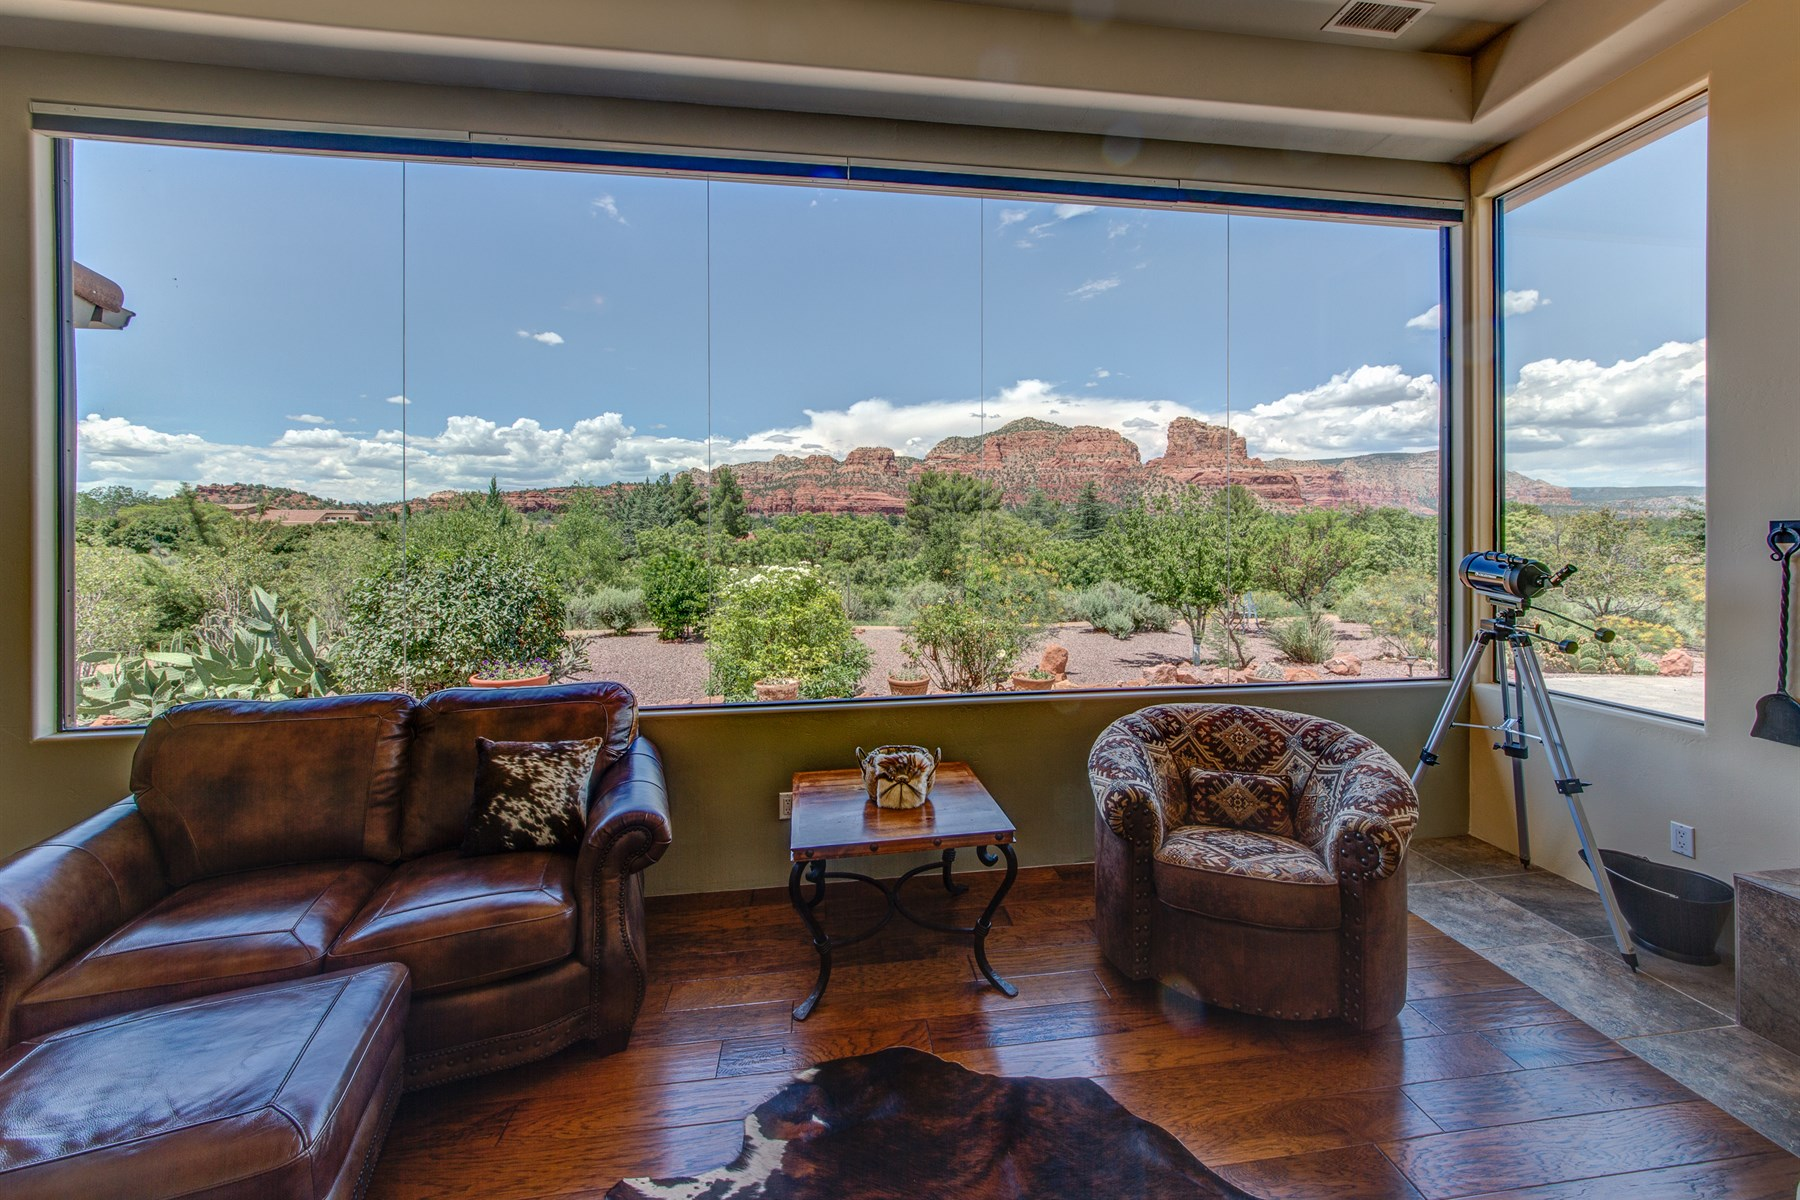 Moradia para Venda às Enchanted by Sedona's beauty, stunning million dollar views. 16 Well RD Sedona, Arizona 86351 Estados Unidos